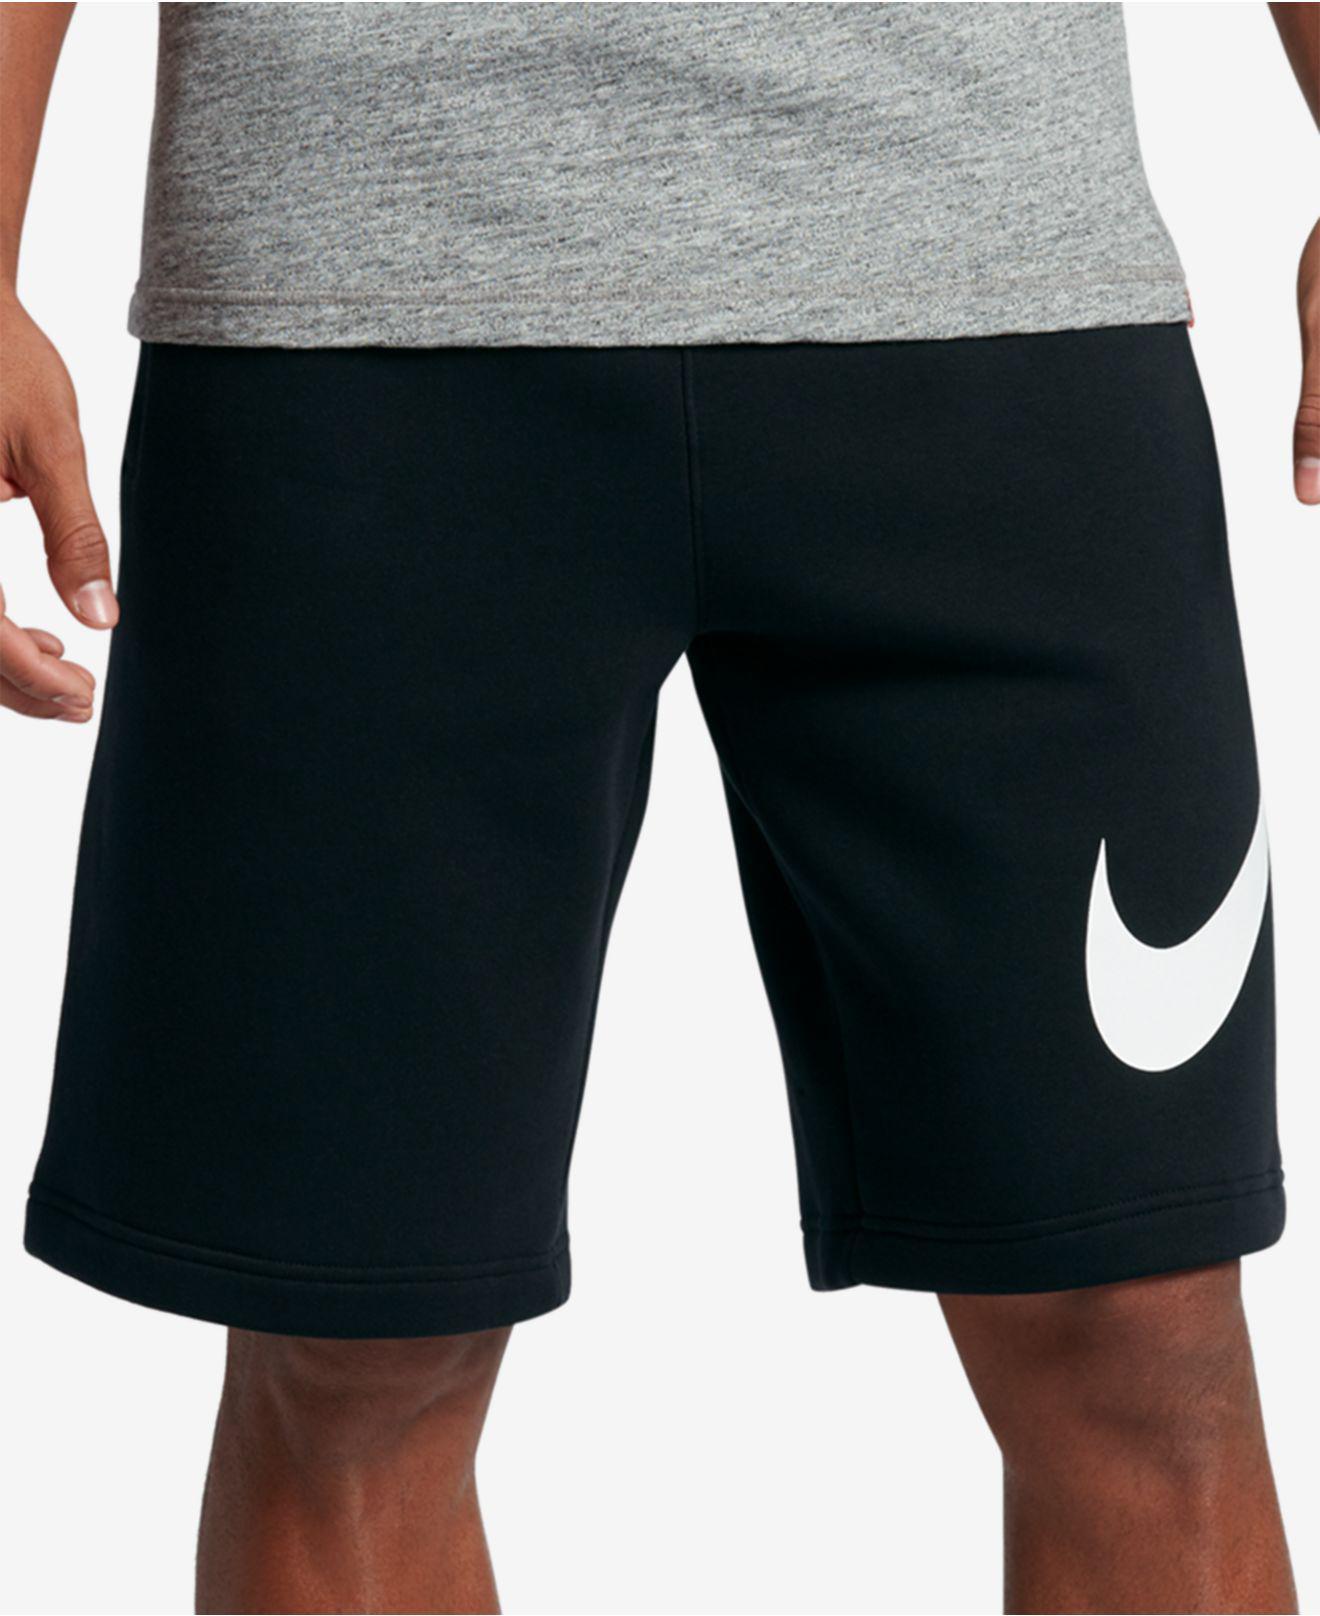 71b5d64b1c5256 Lyst - Nike Men s Club Fleece Shorts in Black for Men